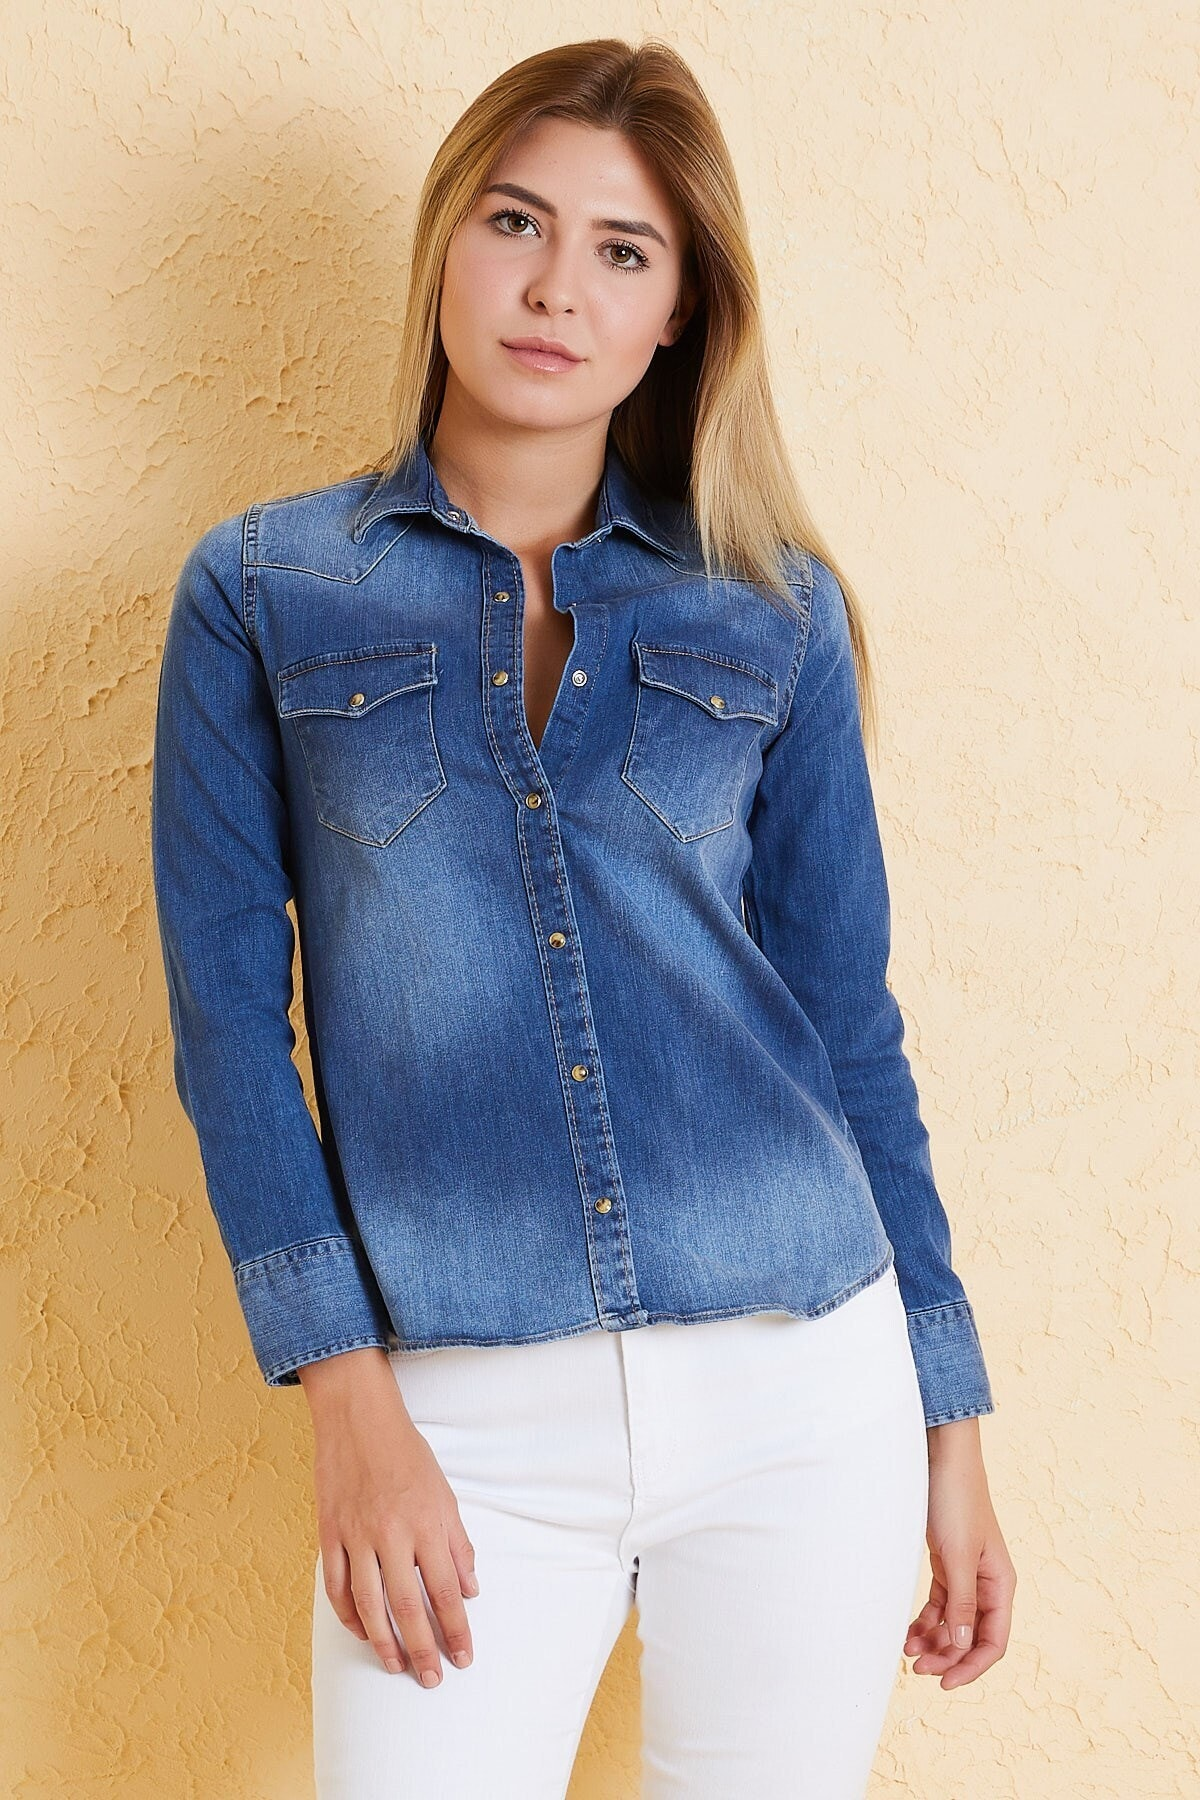 Twister Jeans Kadın Slim Fit Gömlek Bg 812-03 A.mavı 1